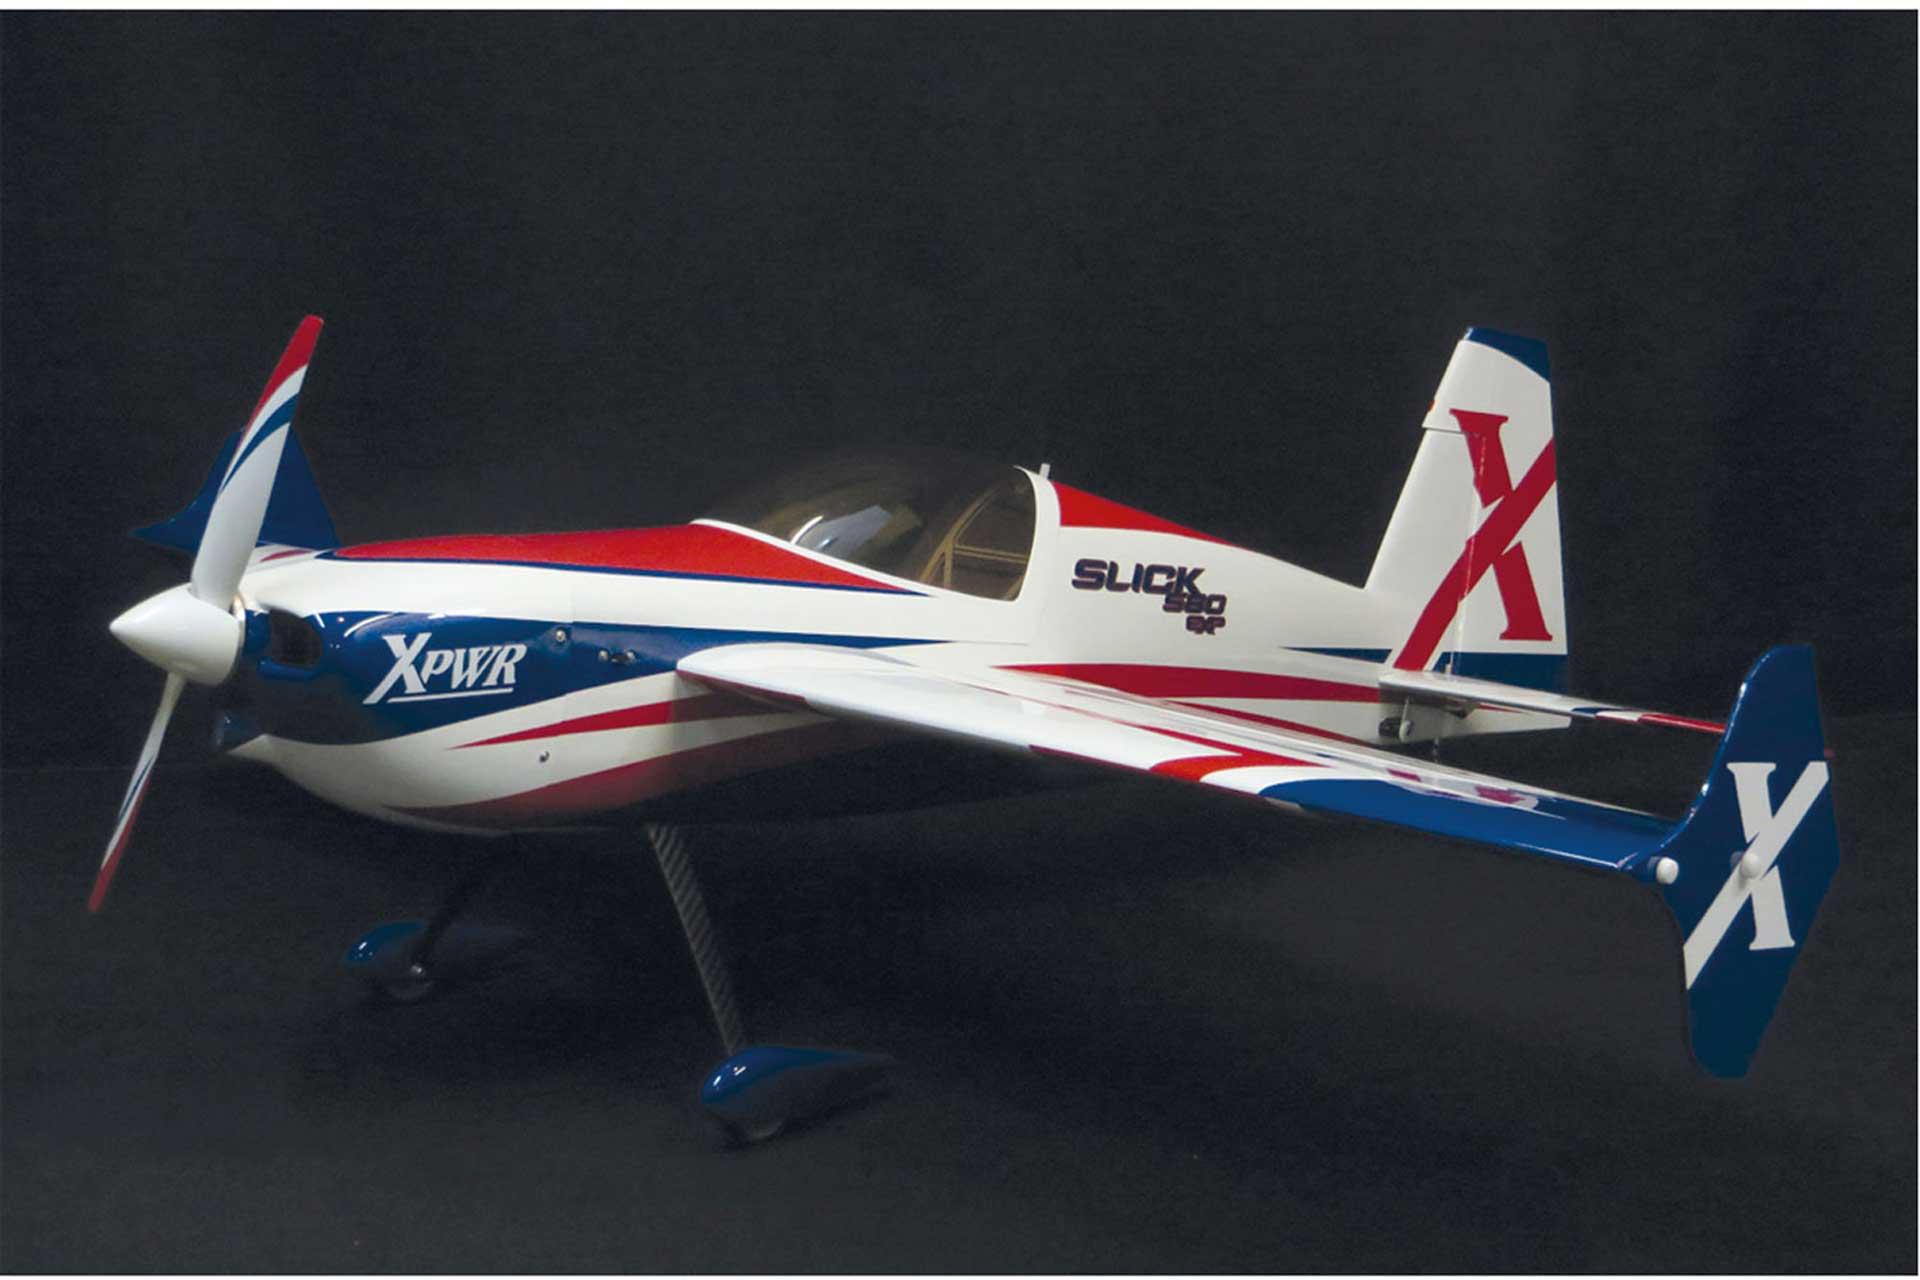 "EXTREMEFLIGHT-RC SLICK 580 74"" ARF RED/ WHITE"